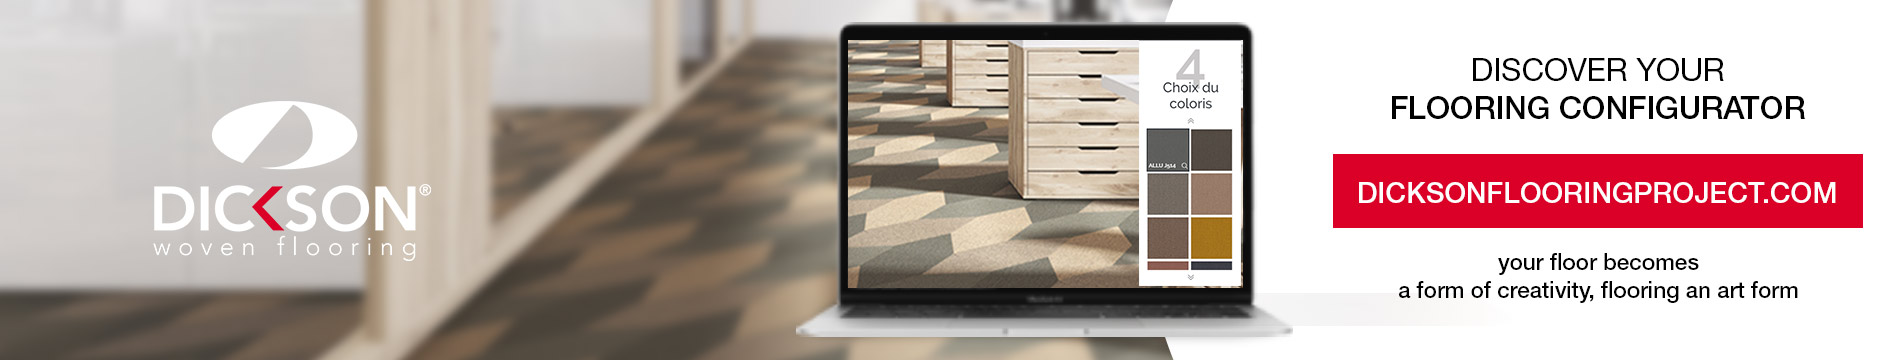 Dickson flooring project